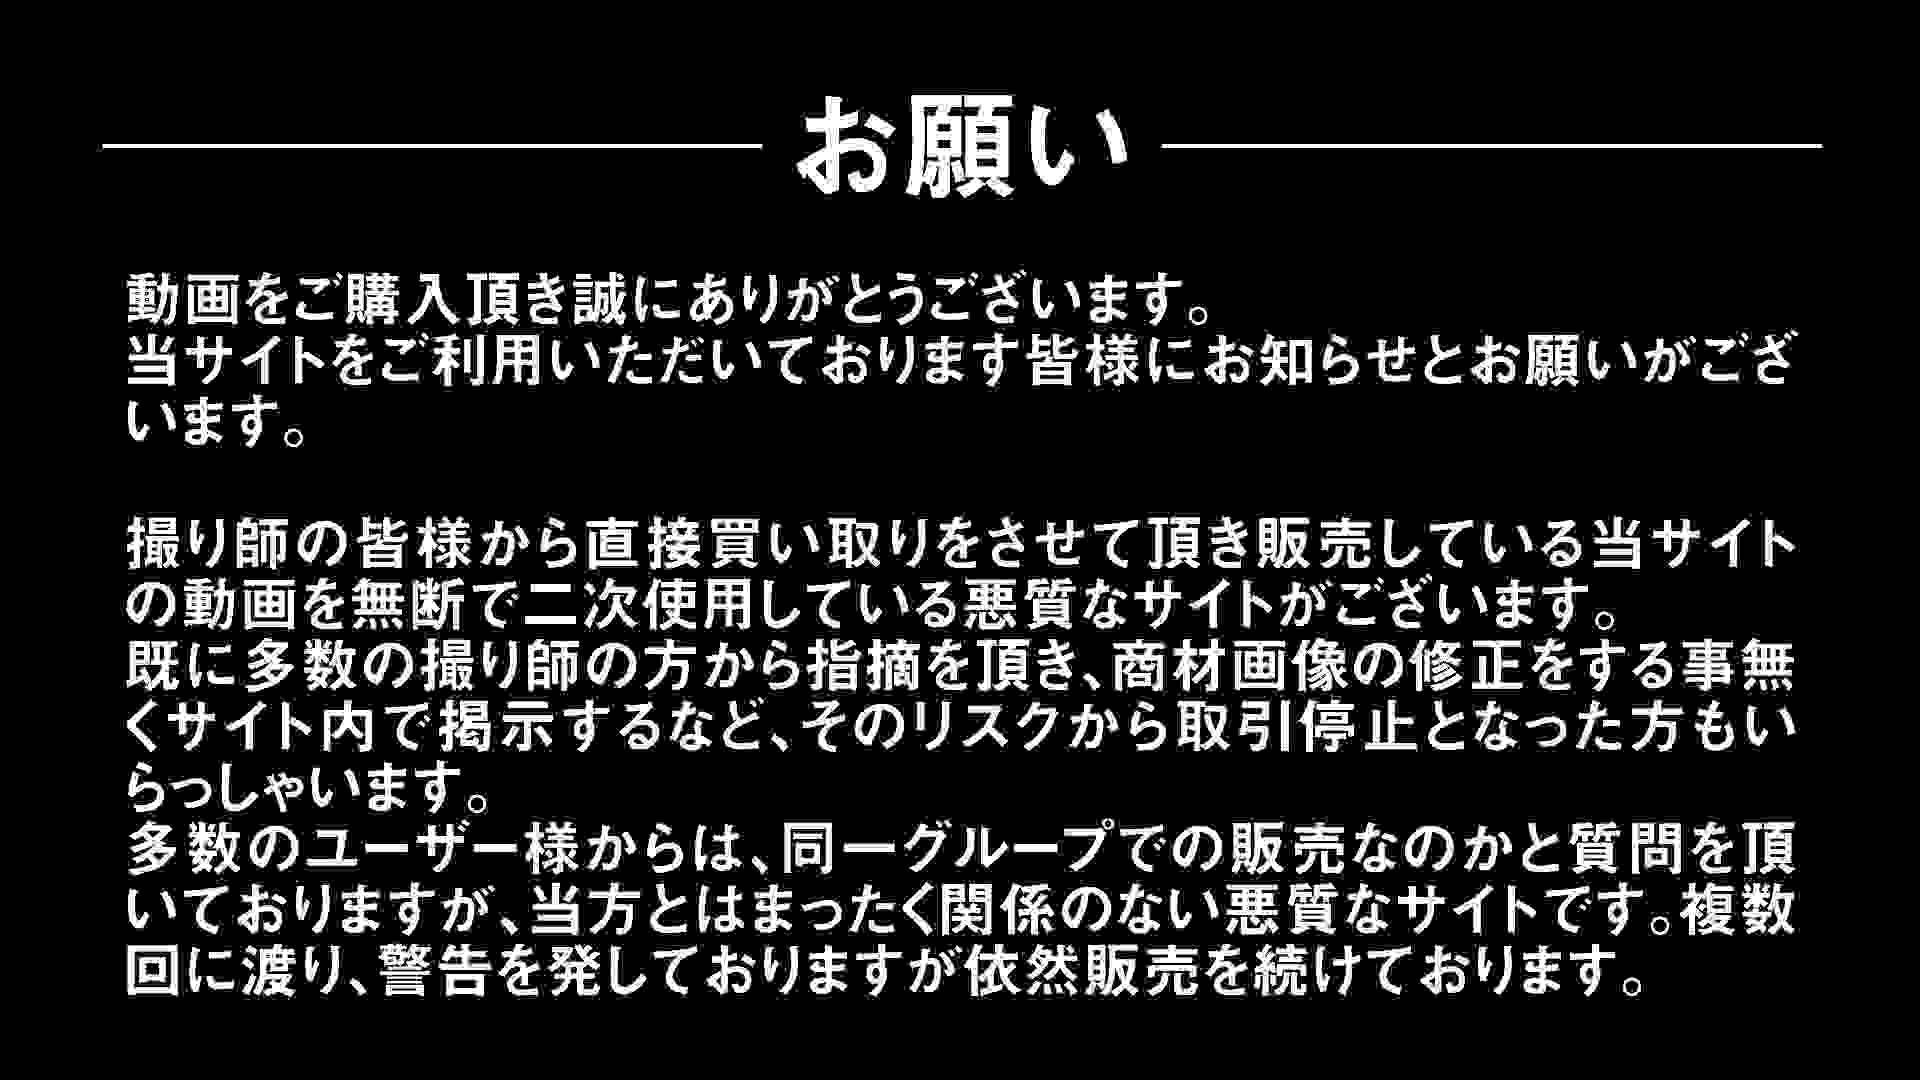 Aquaな露天風呂Vol.301 盗撮  112連発 27